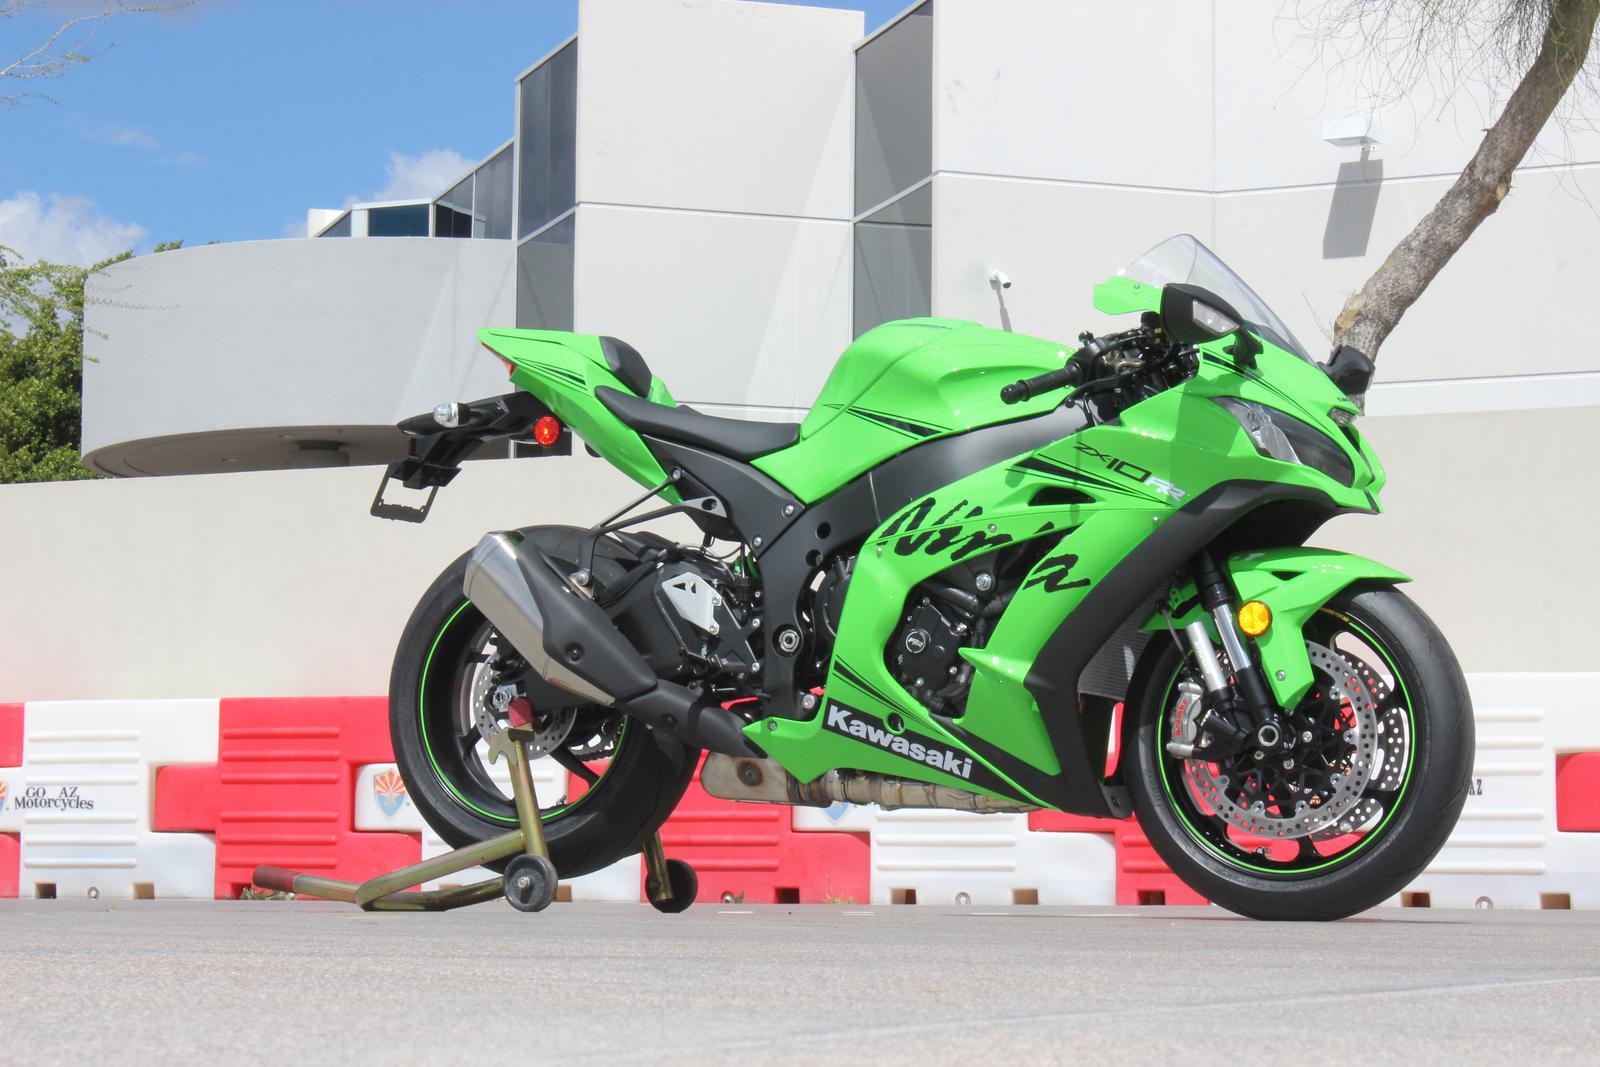 2019 Kawasaki Zx10rr For Sale In Scottsdale Az Go Az Motorcycles